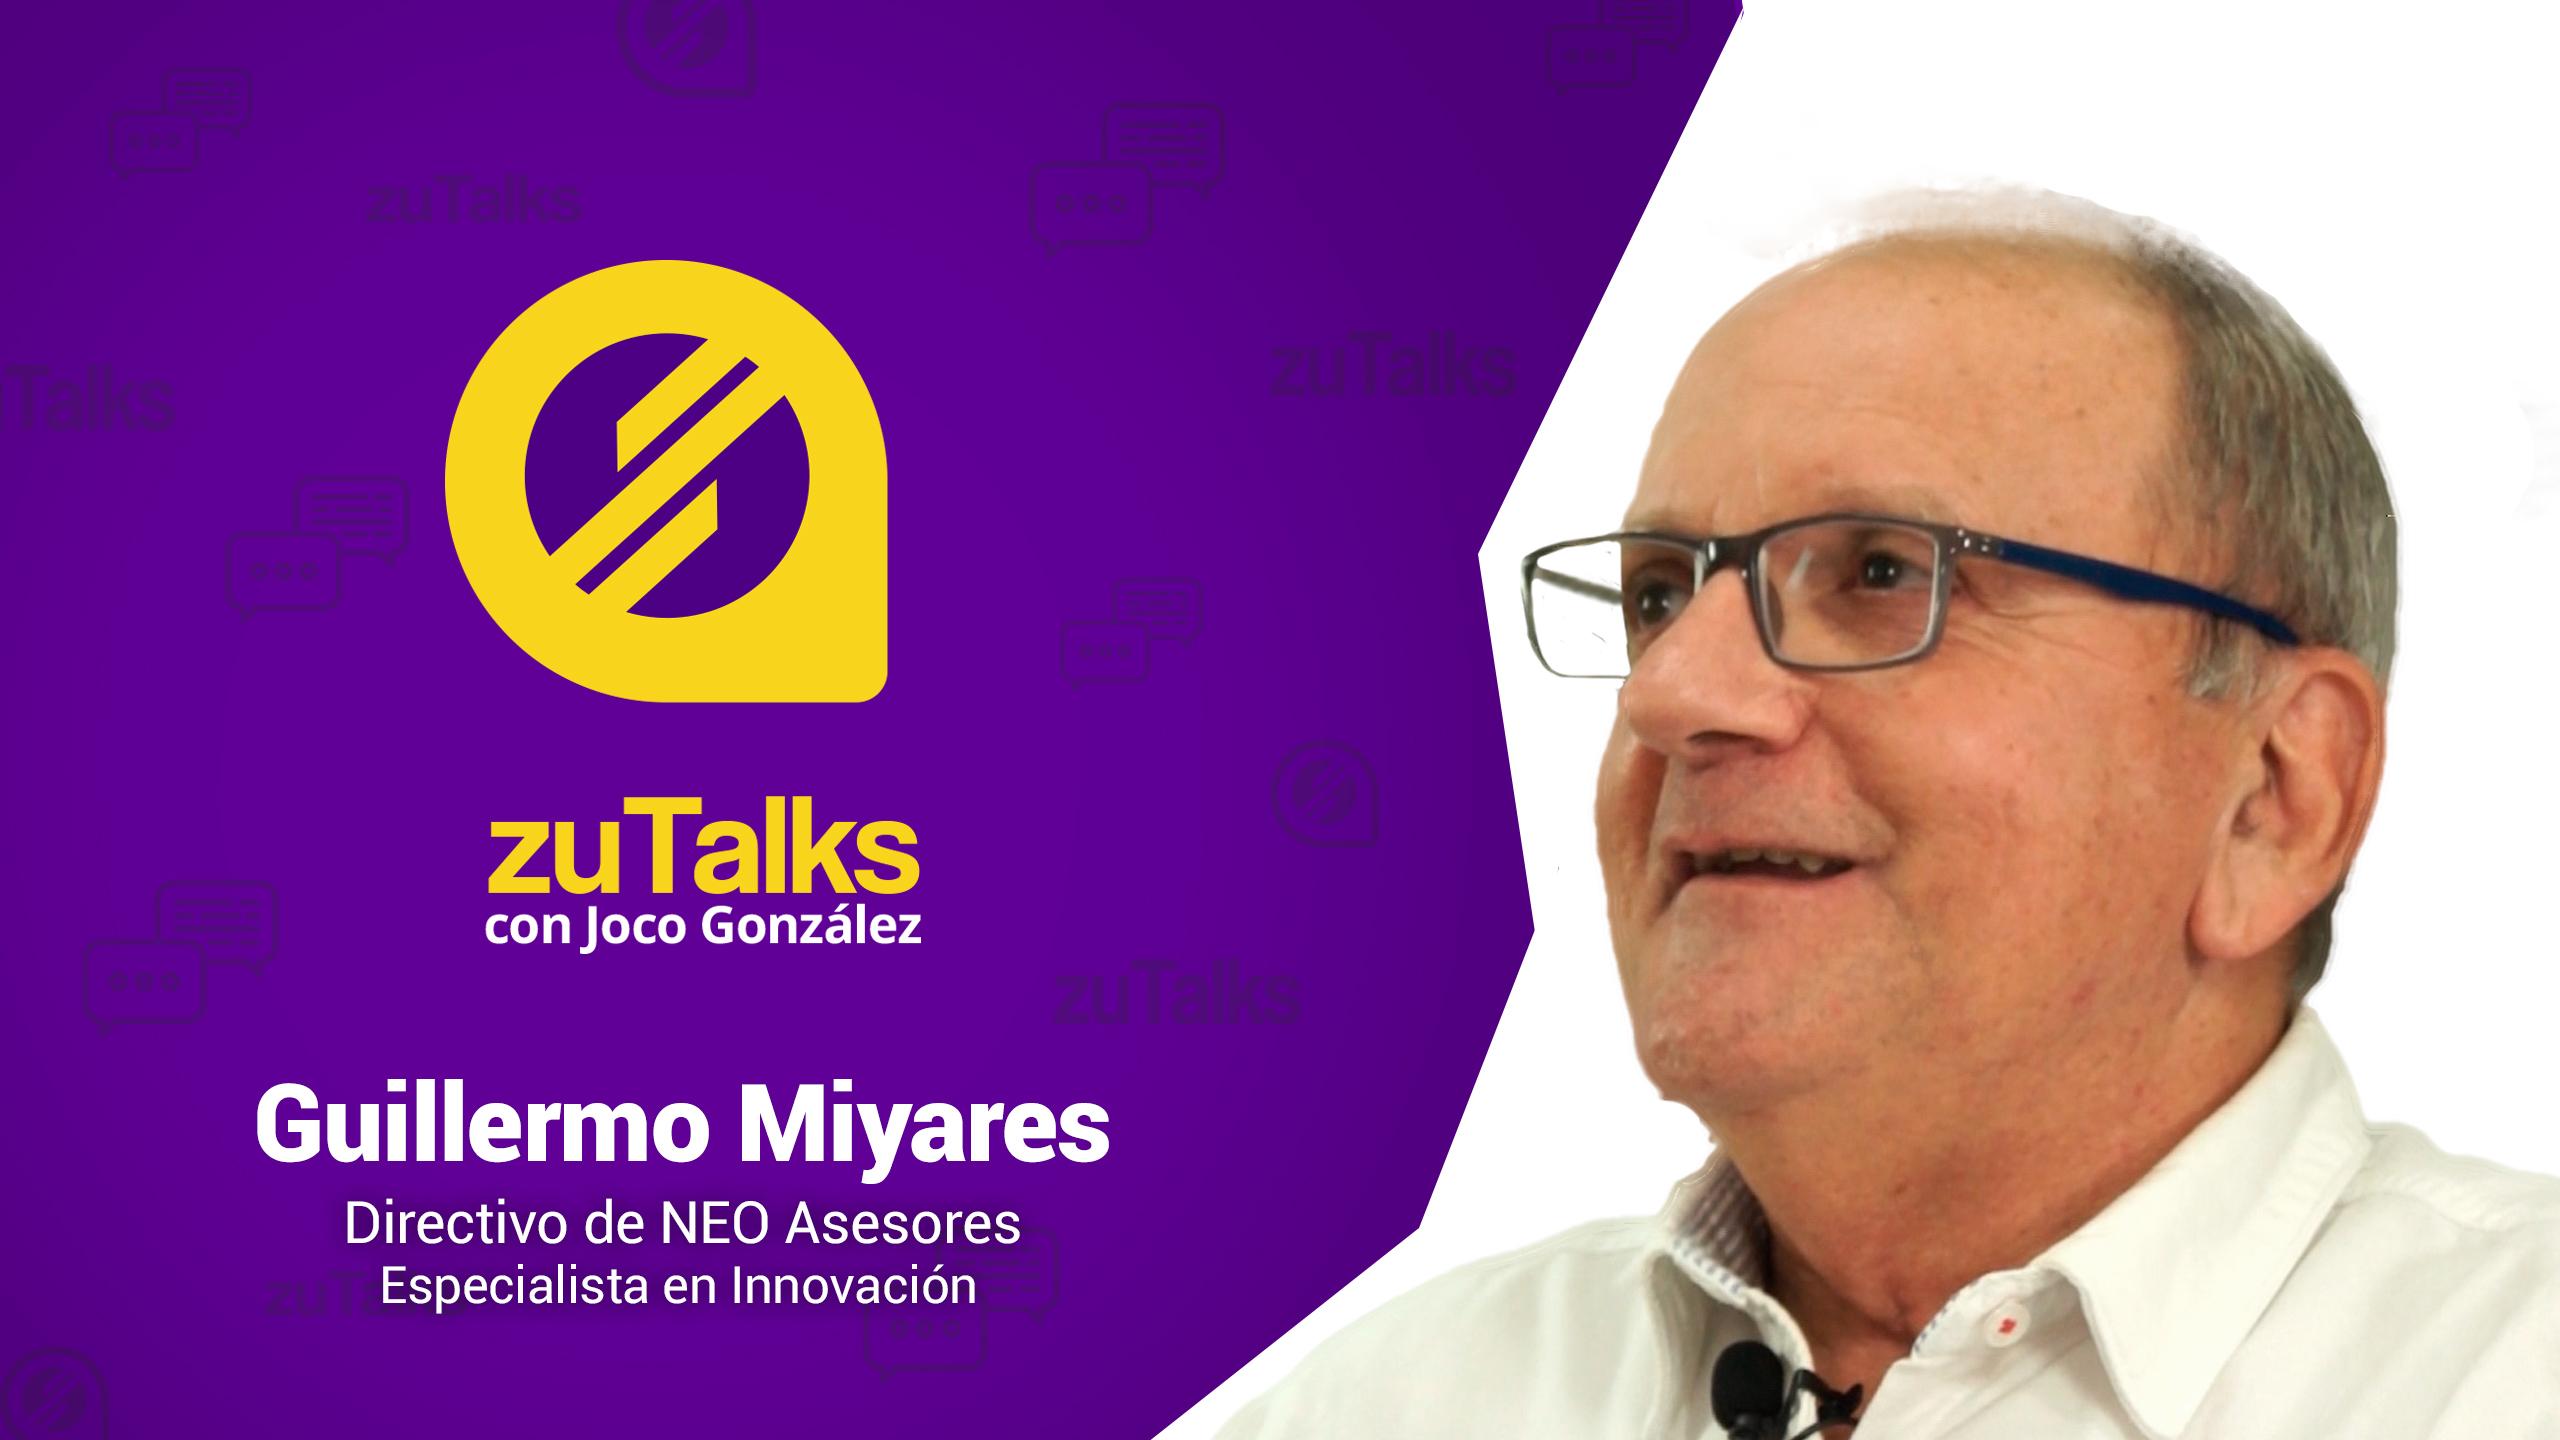 innovacion-empresarial-venezuela-zuliatec-zuTalks